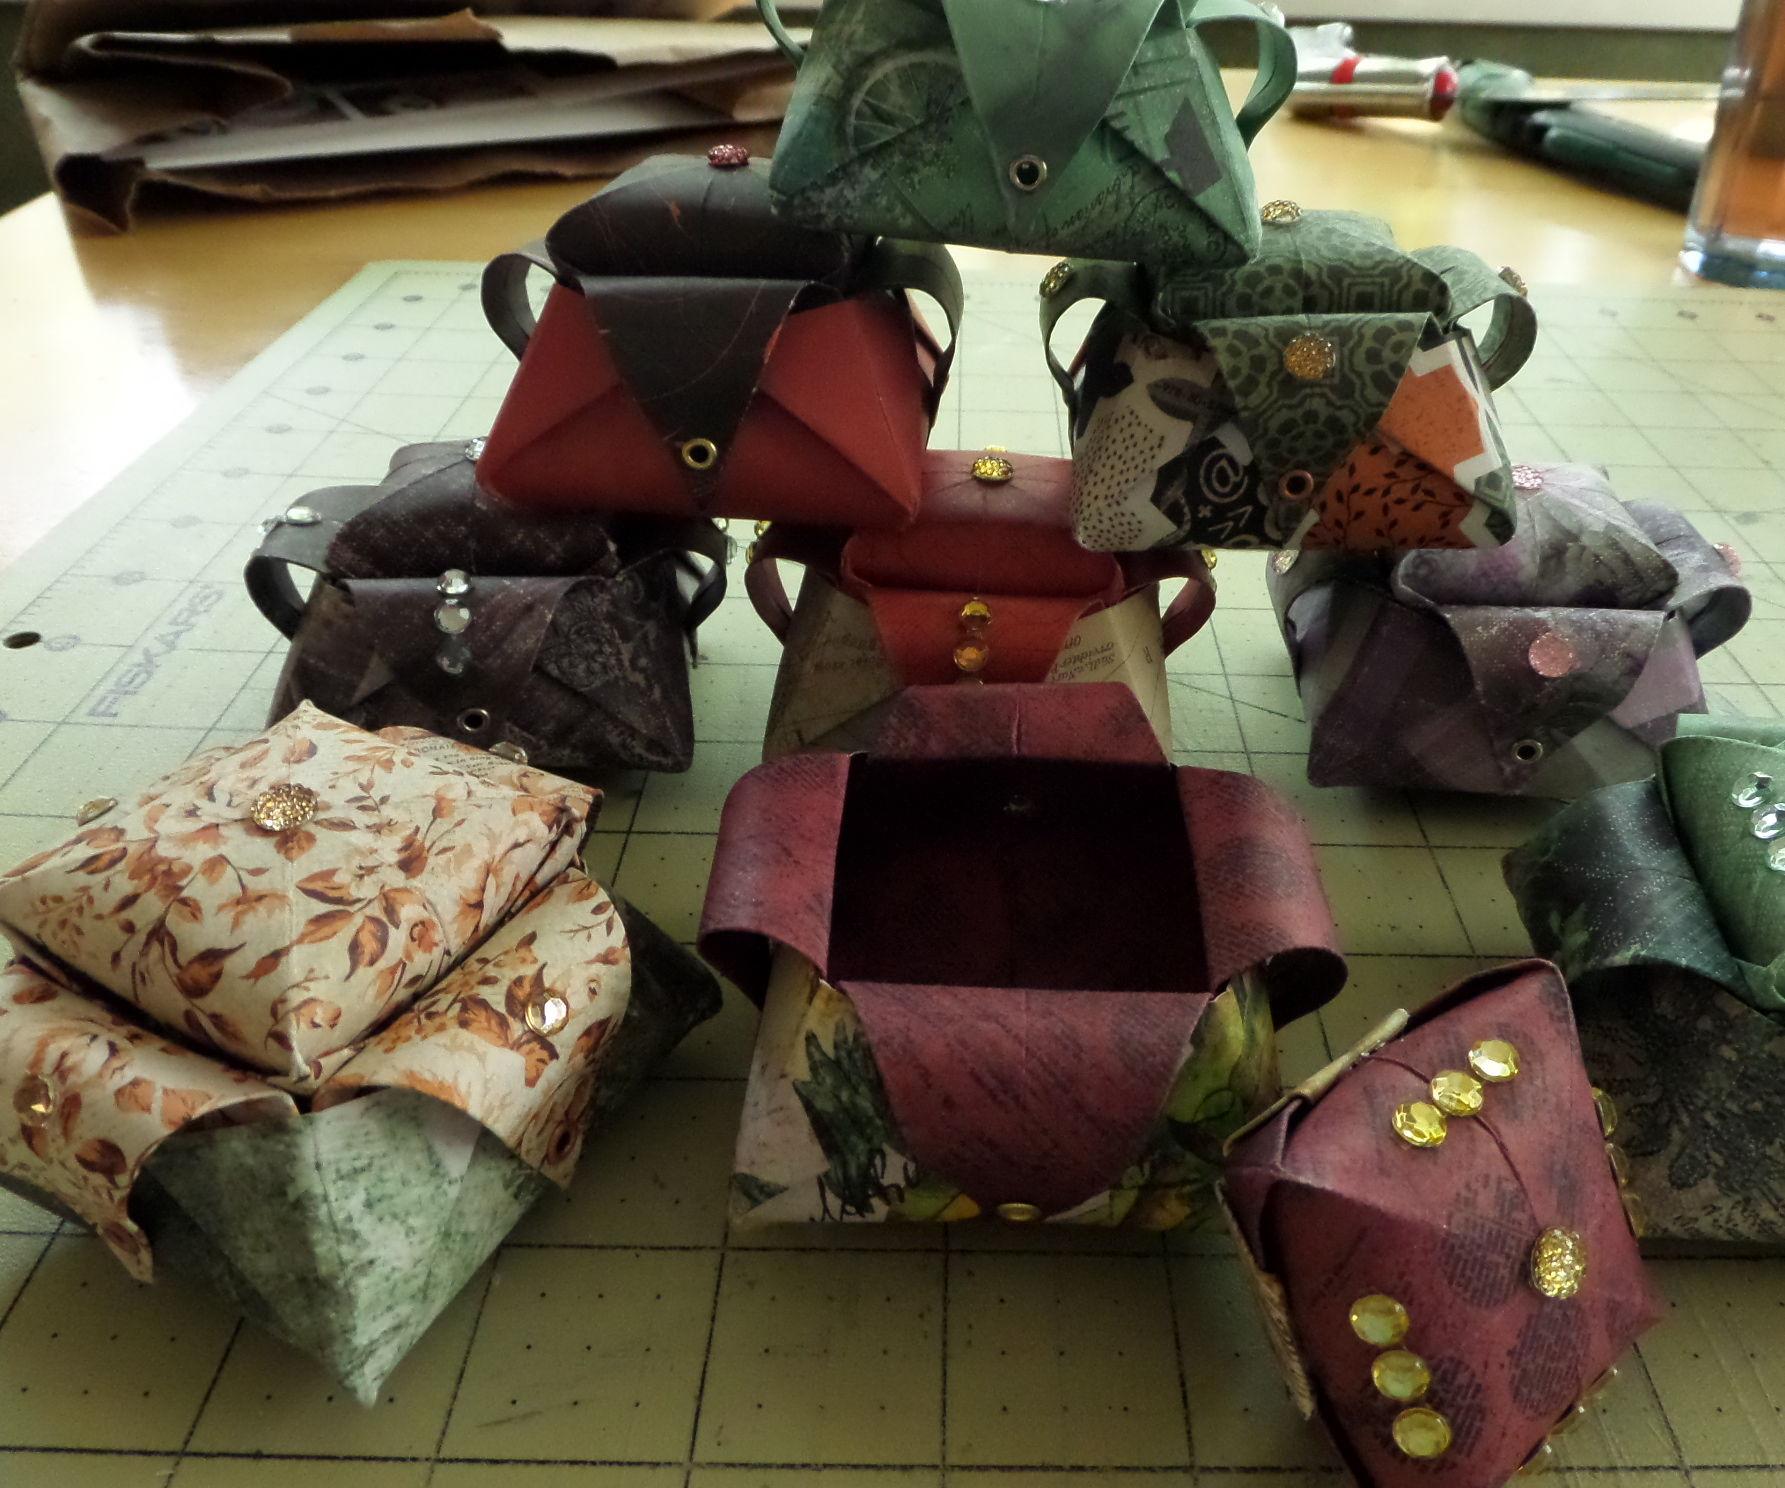 Decorative Origami Gift Box: Part 1, the Box